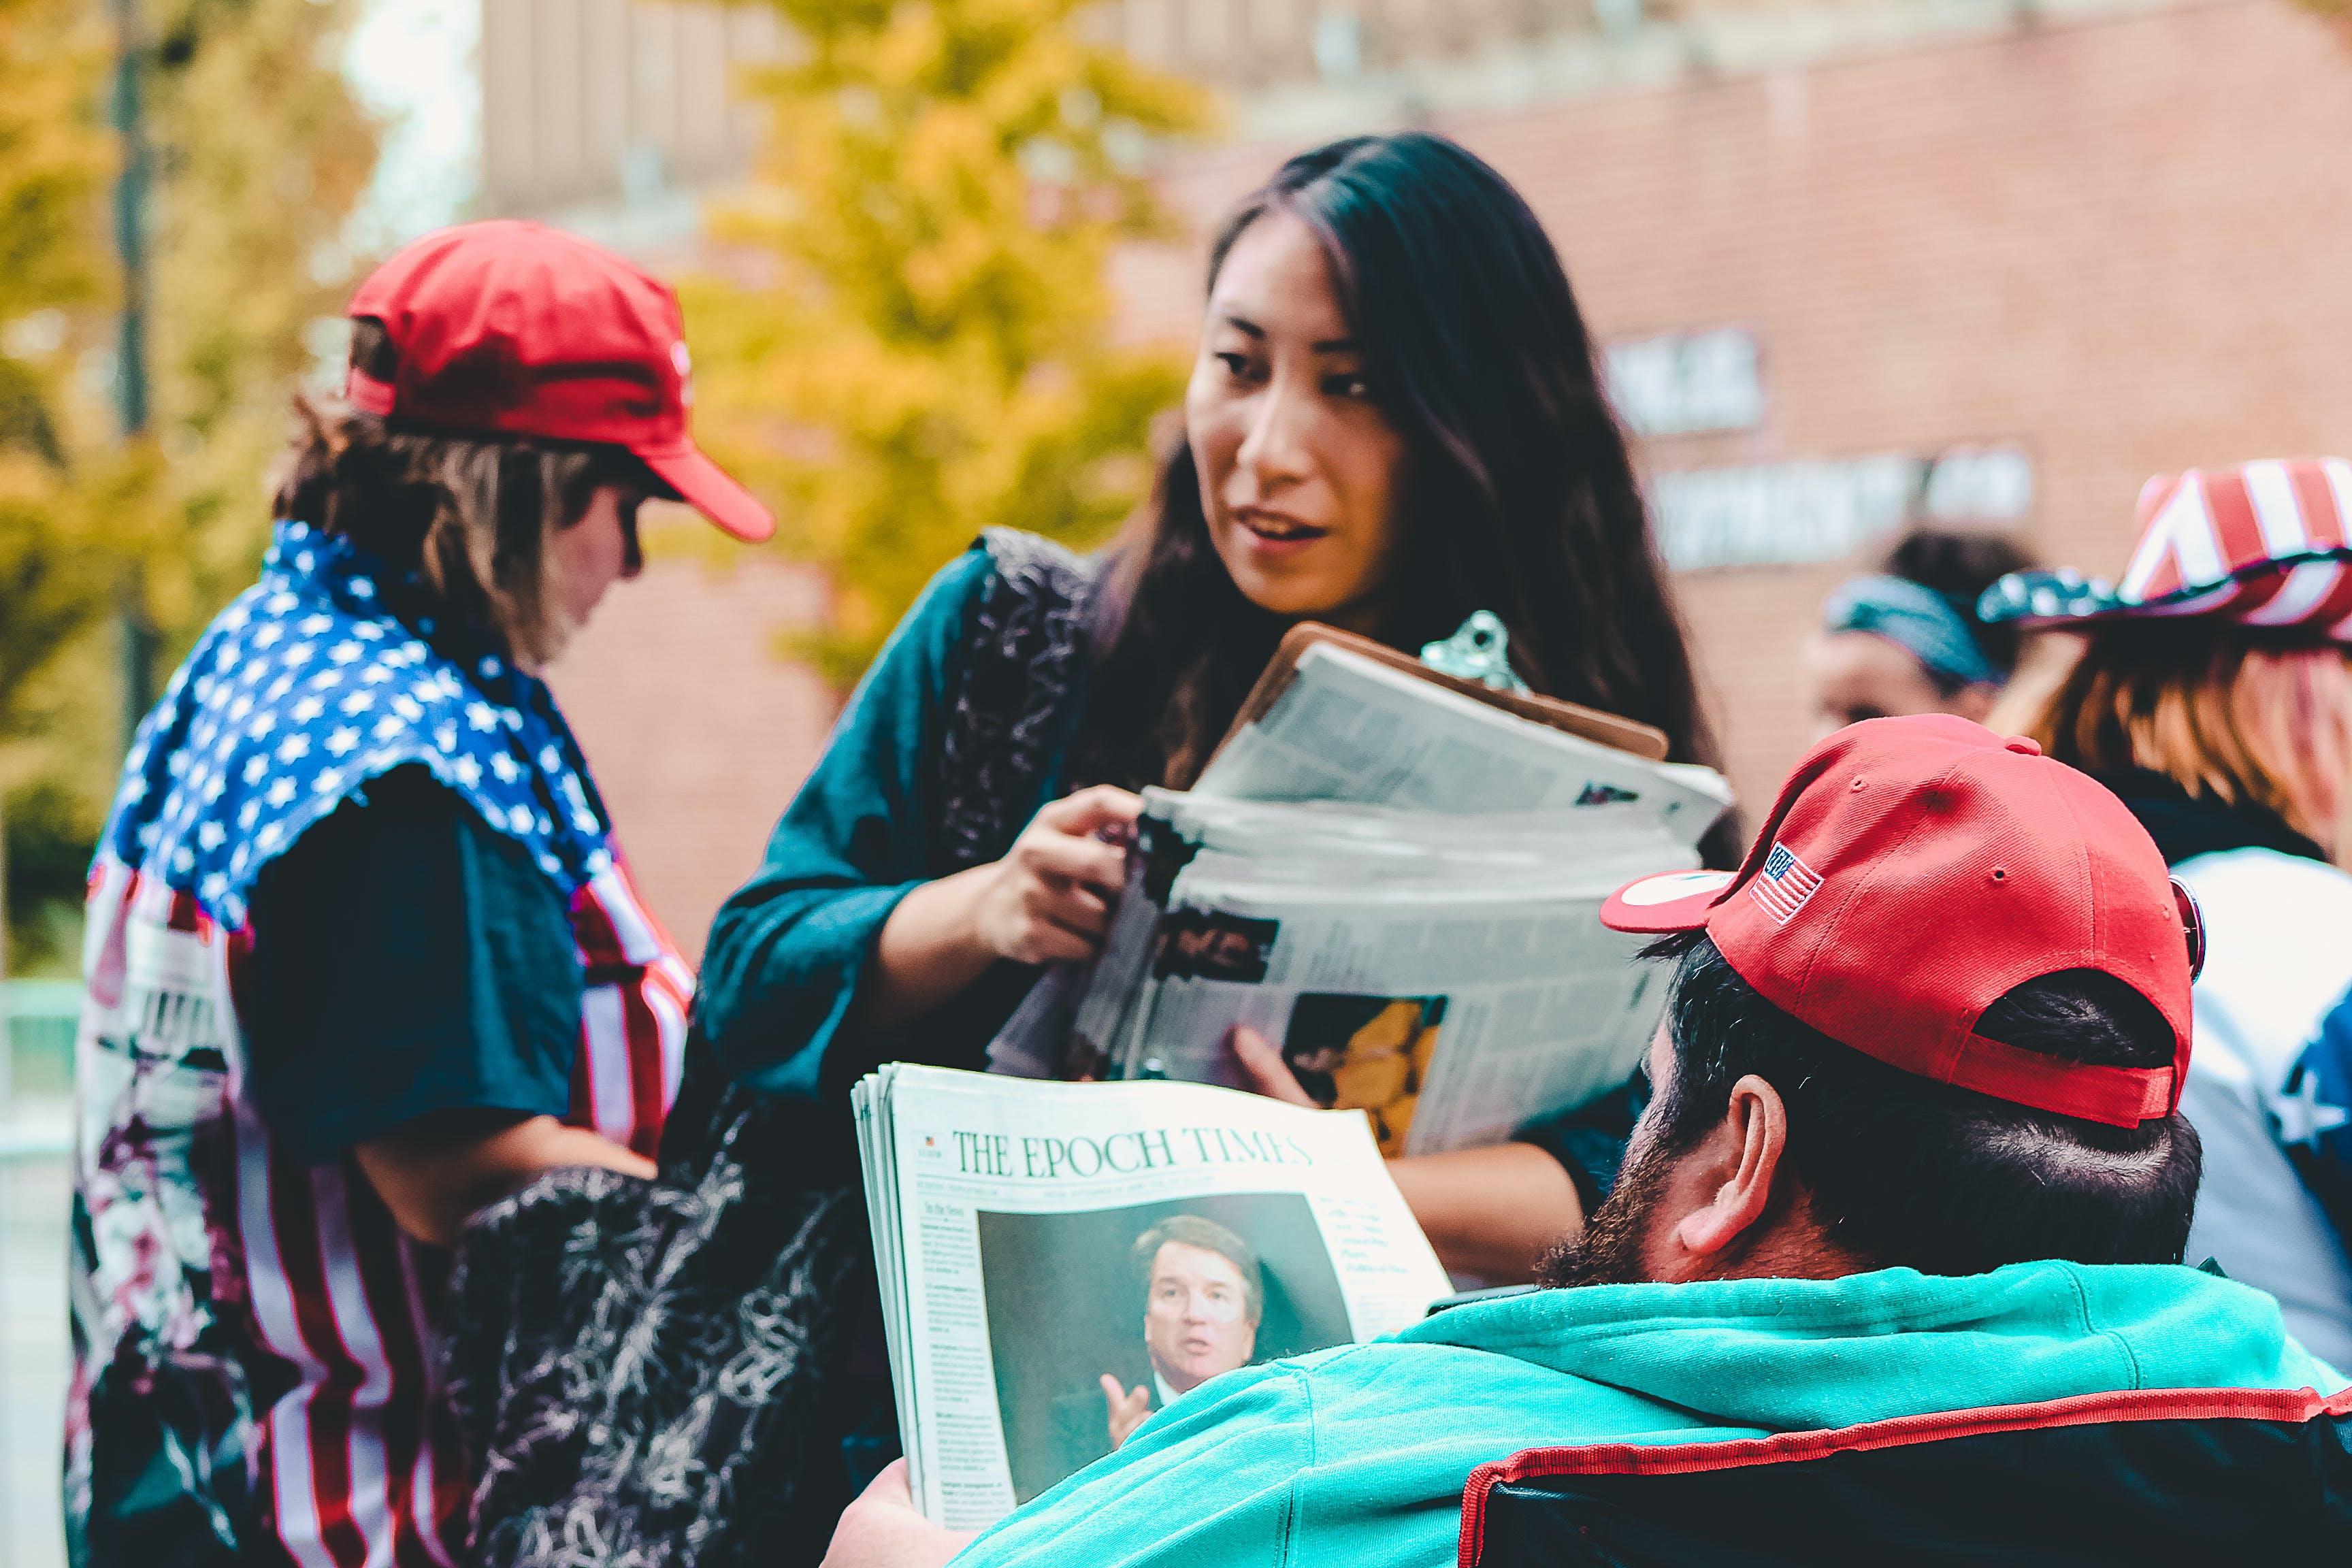 Kostnadsfri bild av dagliga nyheter, fokus, folkmassa, gata